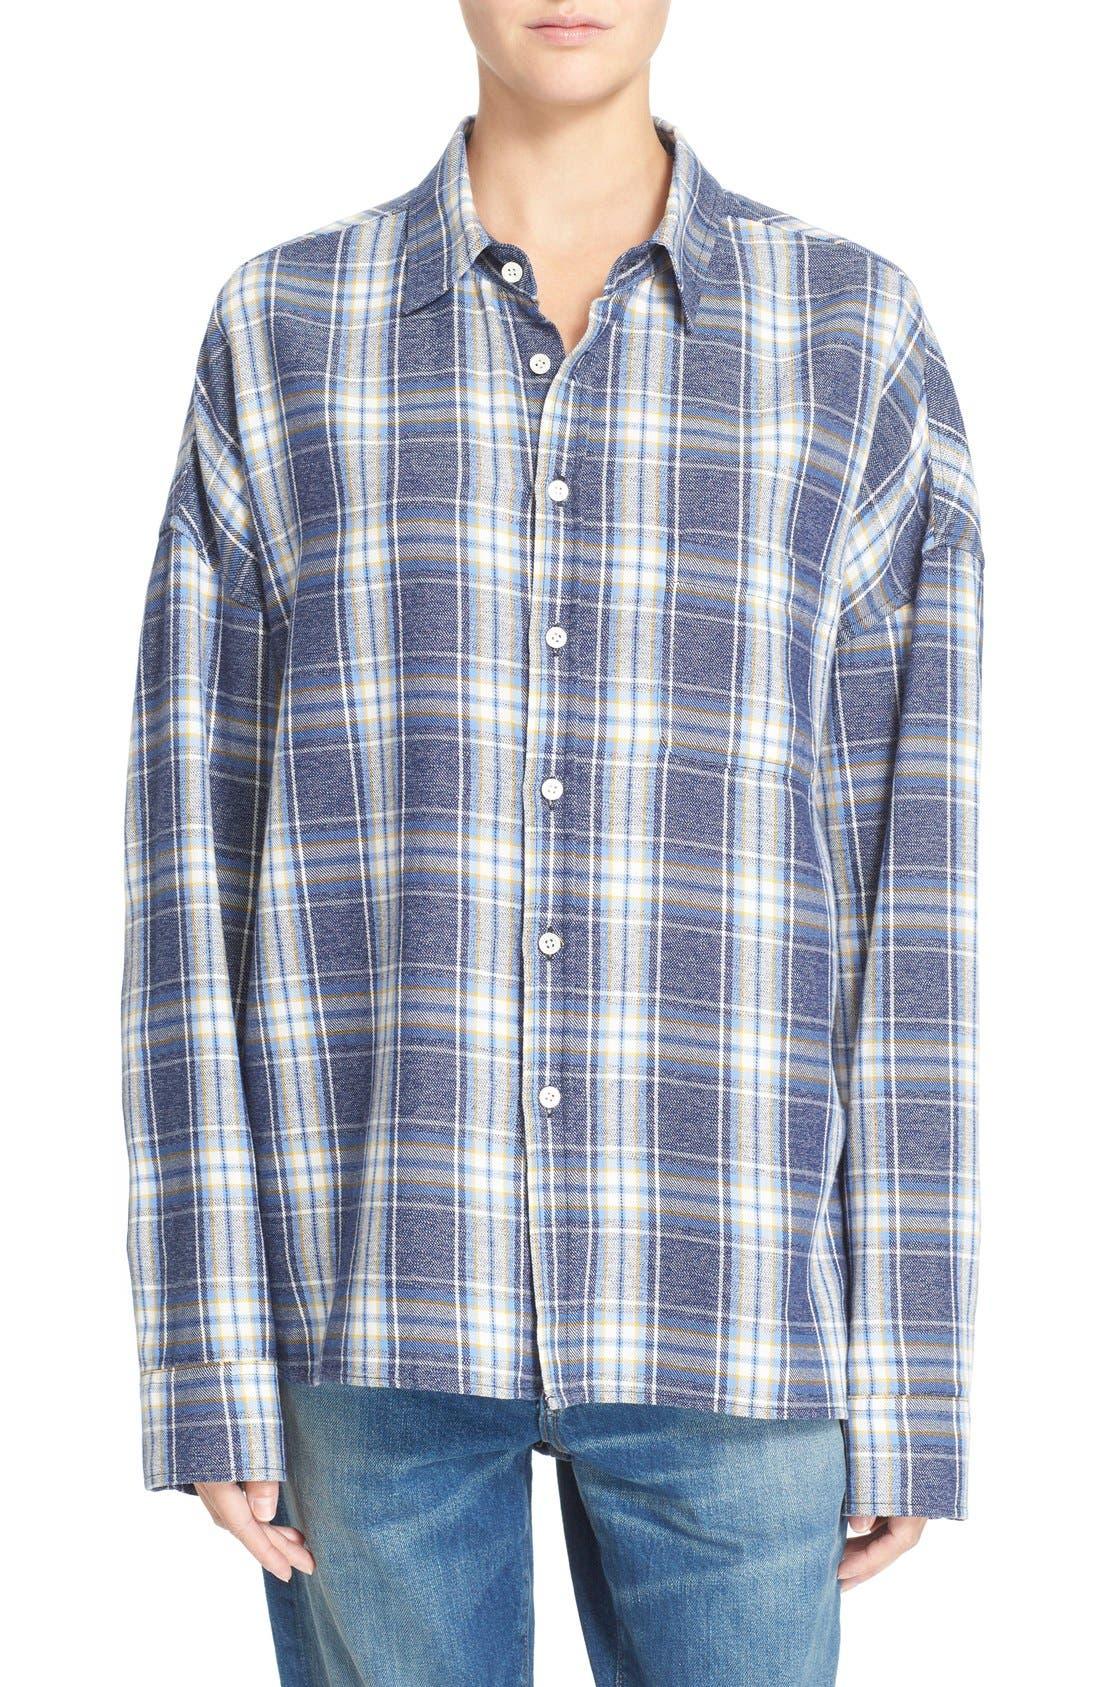 Main Image - 6397 'Lori' Cotton Flannel Shirt